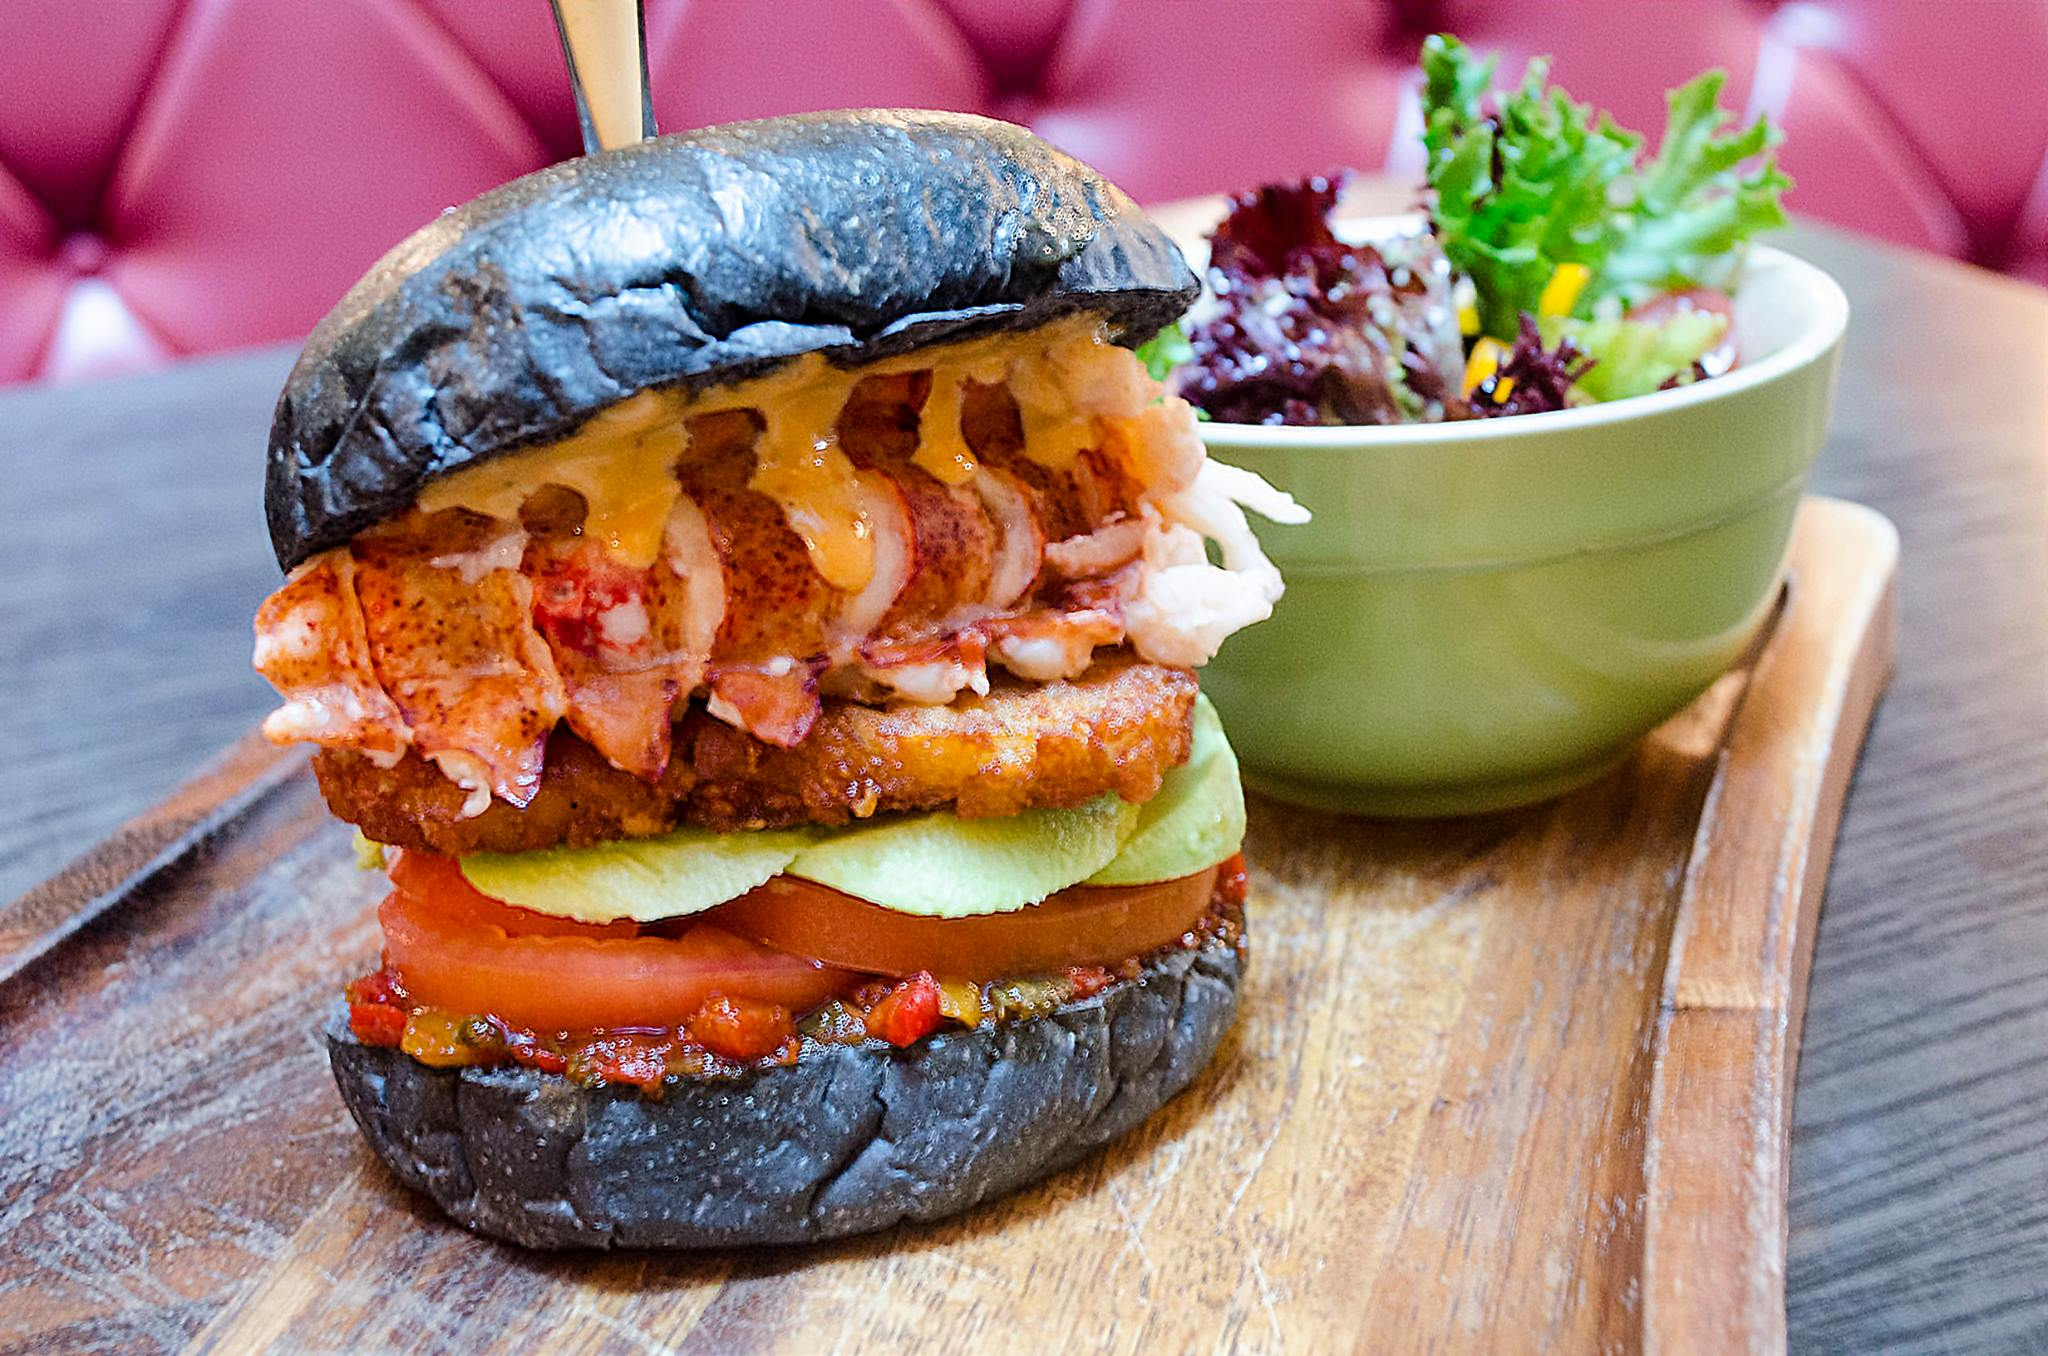 crazy-creative-burgers-singapore-4